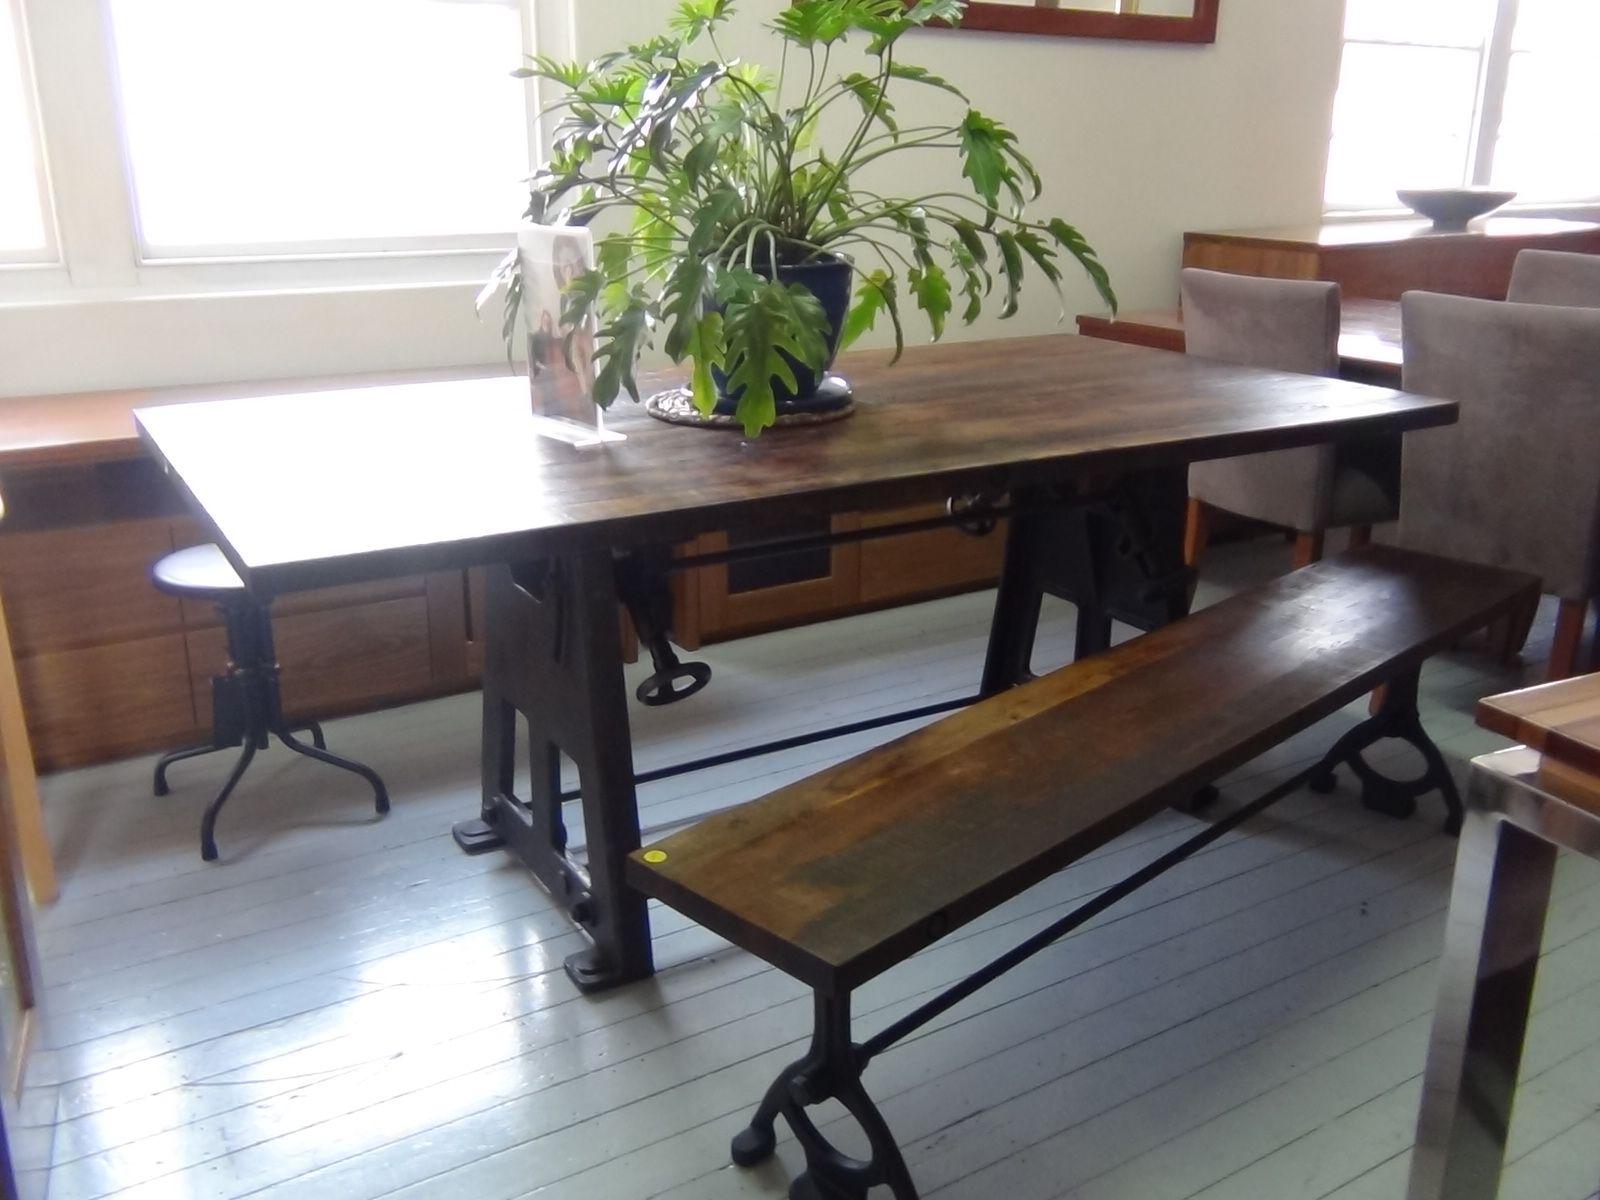 Image for narrow dining table sydney | dining room ideas | Pinterest ...